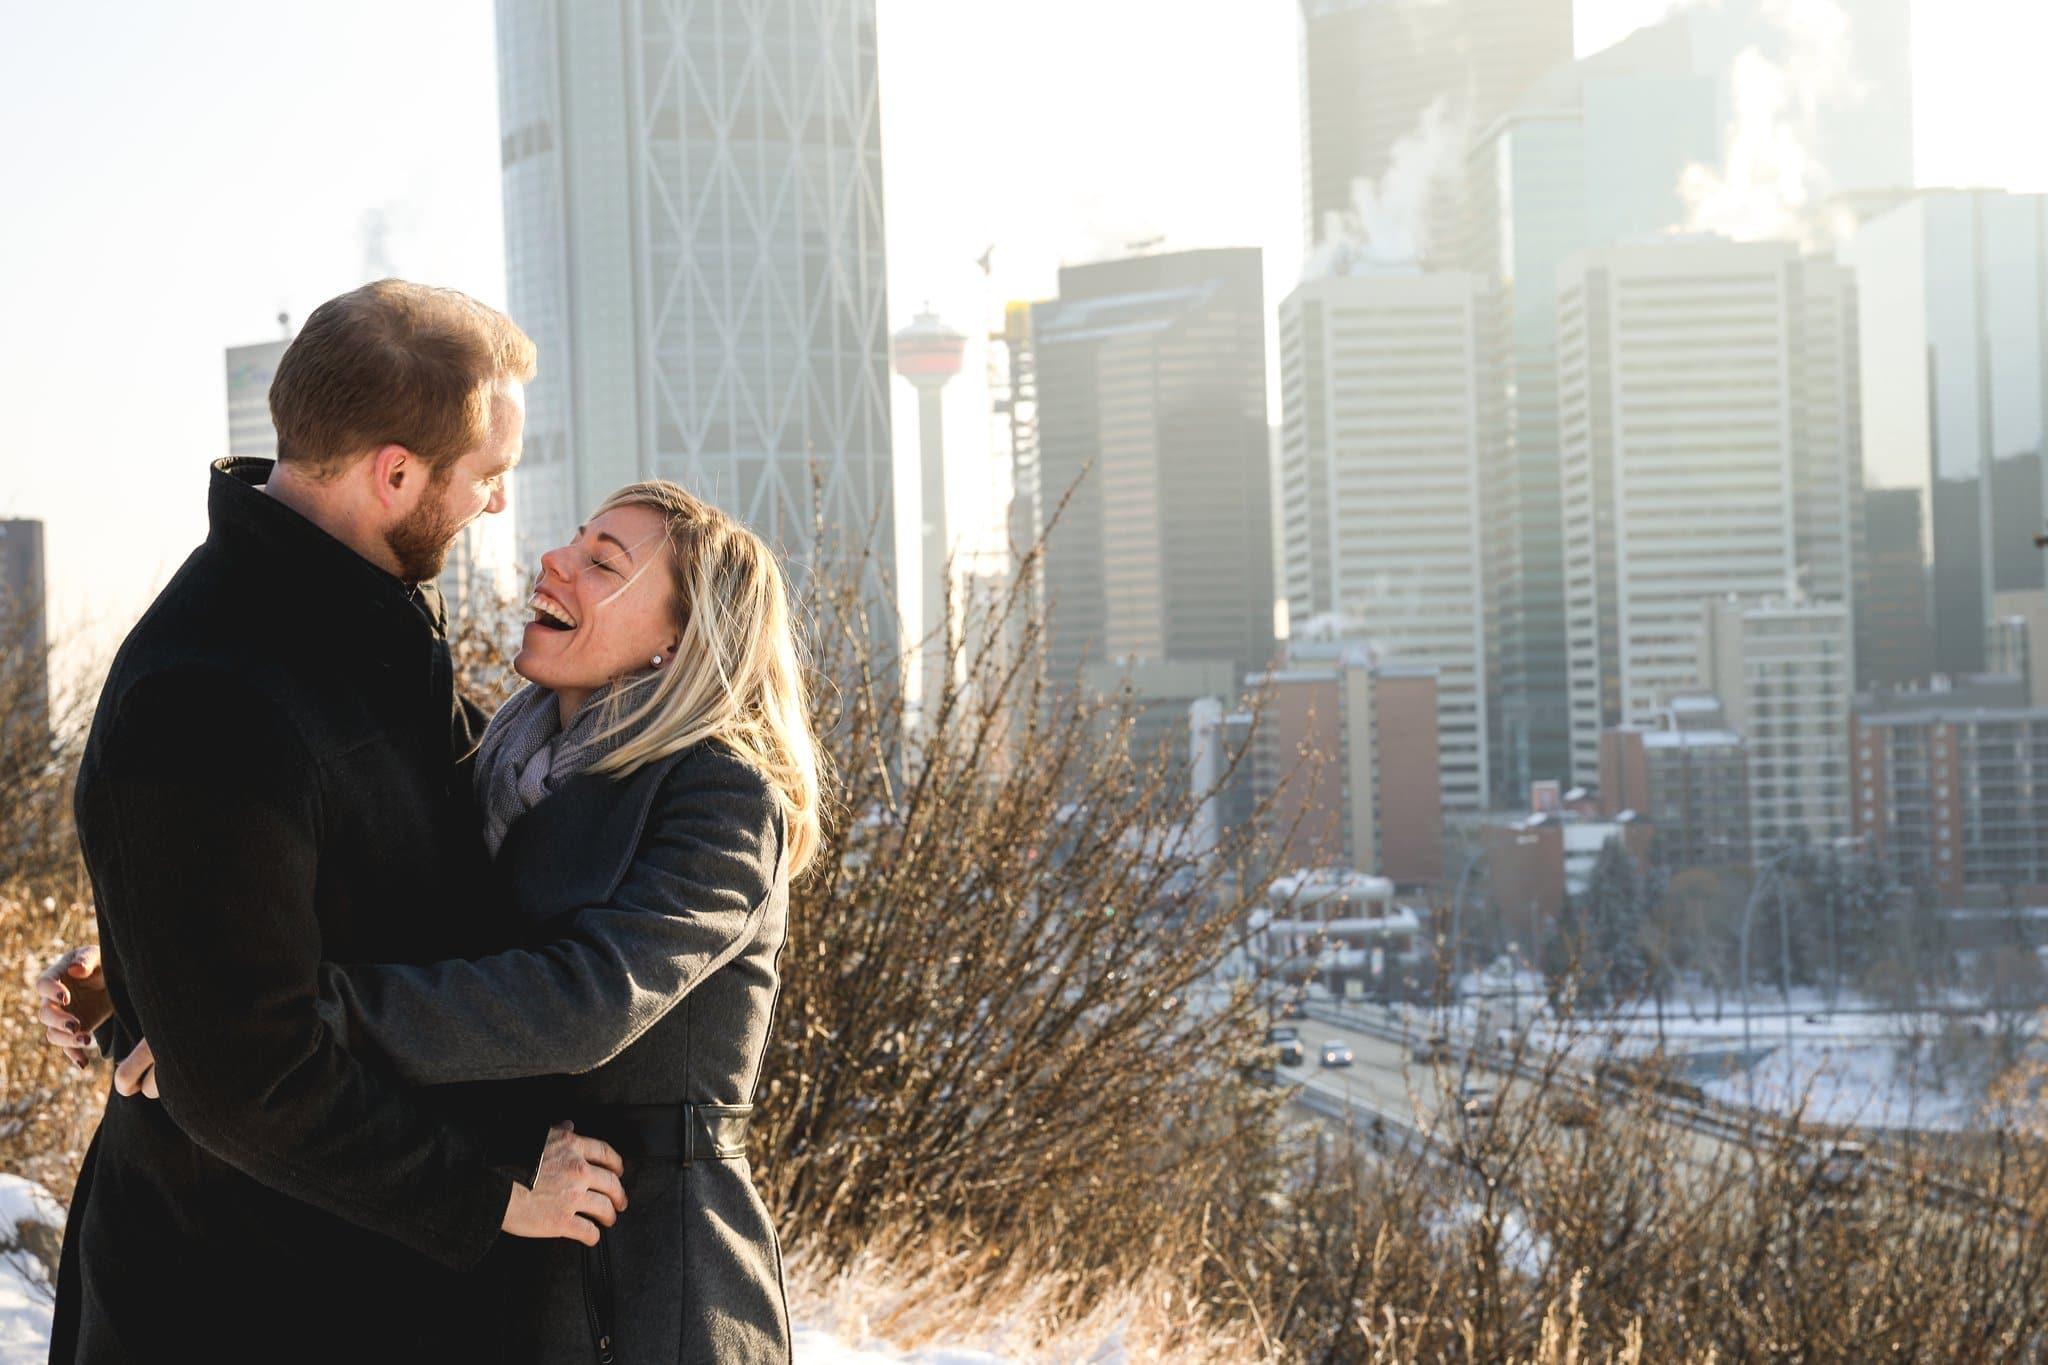 Ashley Daphne Photography Calgary Couple Wedding Photographer Engagement Photos Proposal Photos_0033.jpg